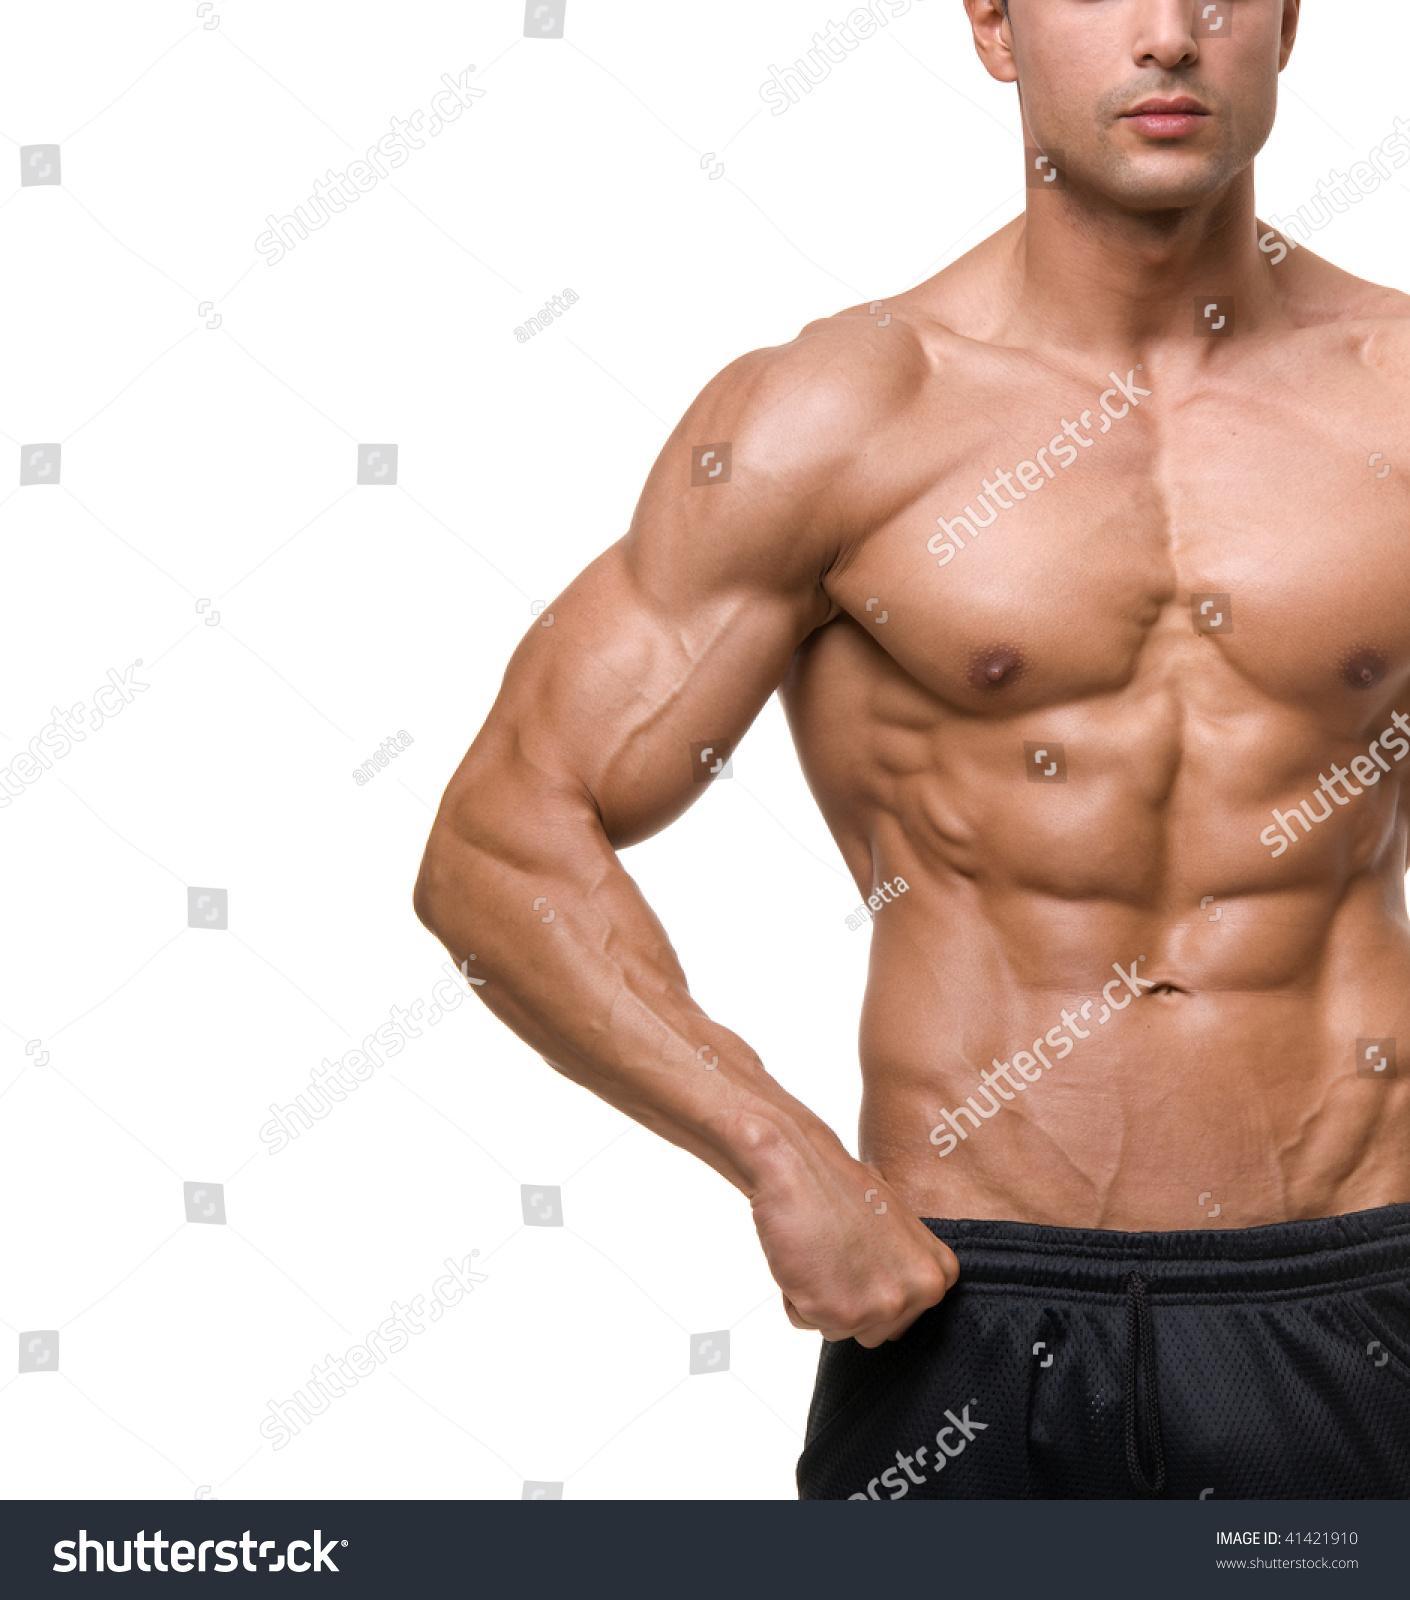 Bodybuilding man Stock Photo 01 free download